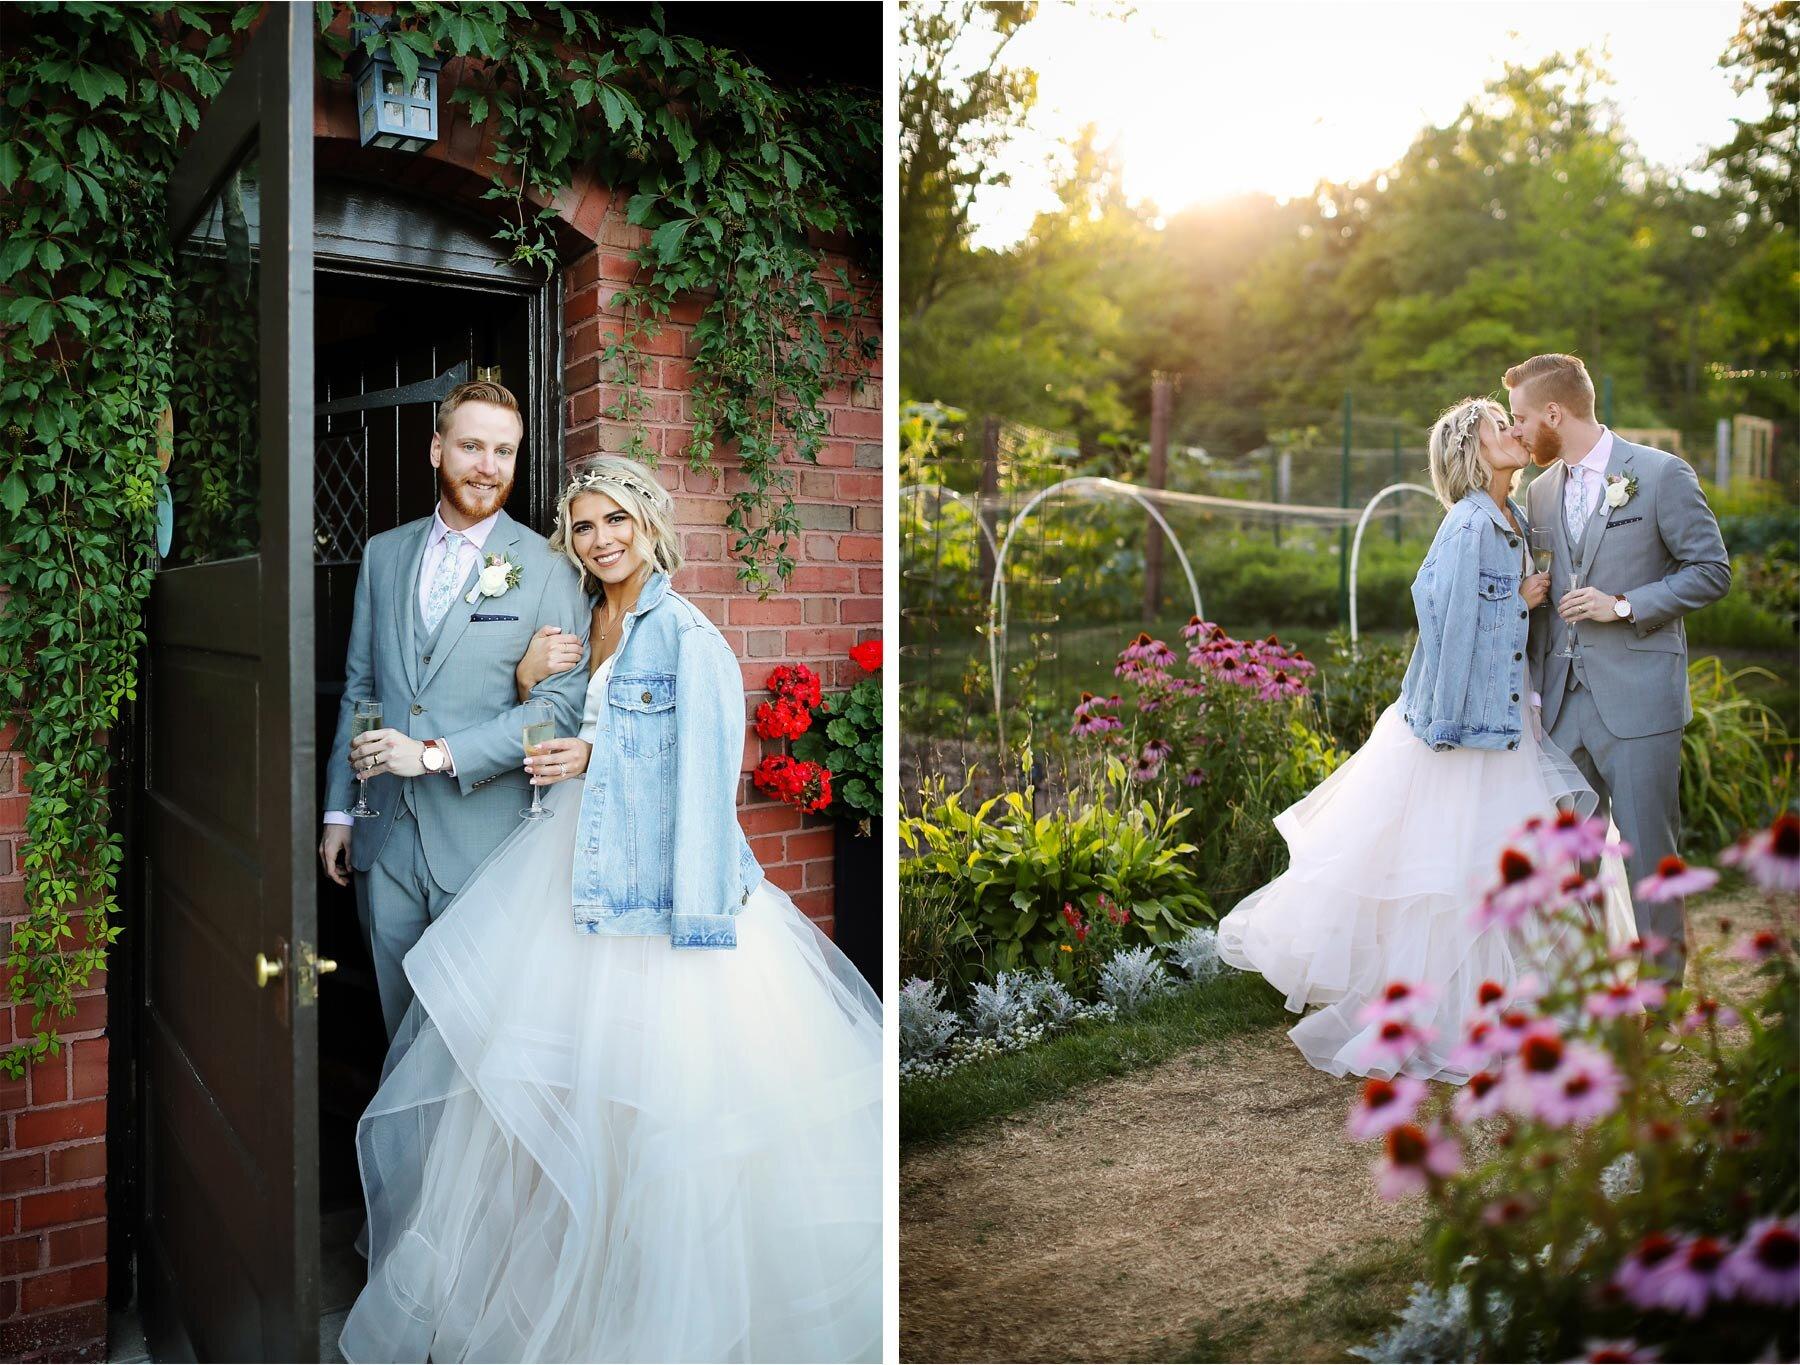 17-Vick-Photography-Wedding-Duluth-Minnesota-Glensheen-Mansion-Bride-Groom-Gardens-Summer-Flowers-Jean-Jacket-Catherine-and-John.jpg